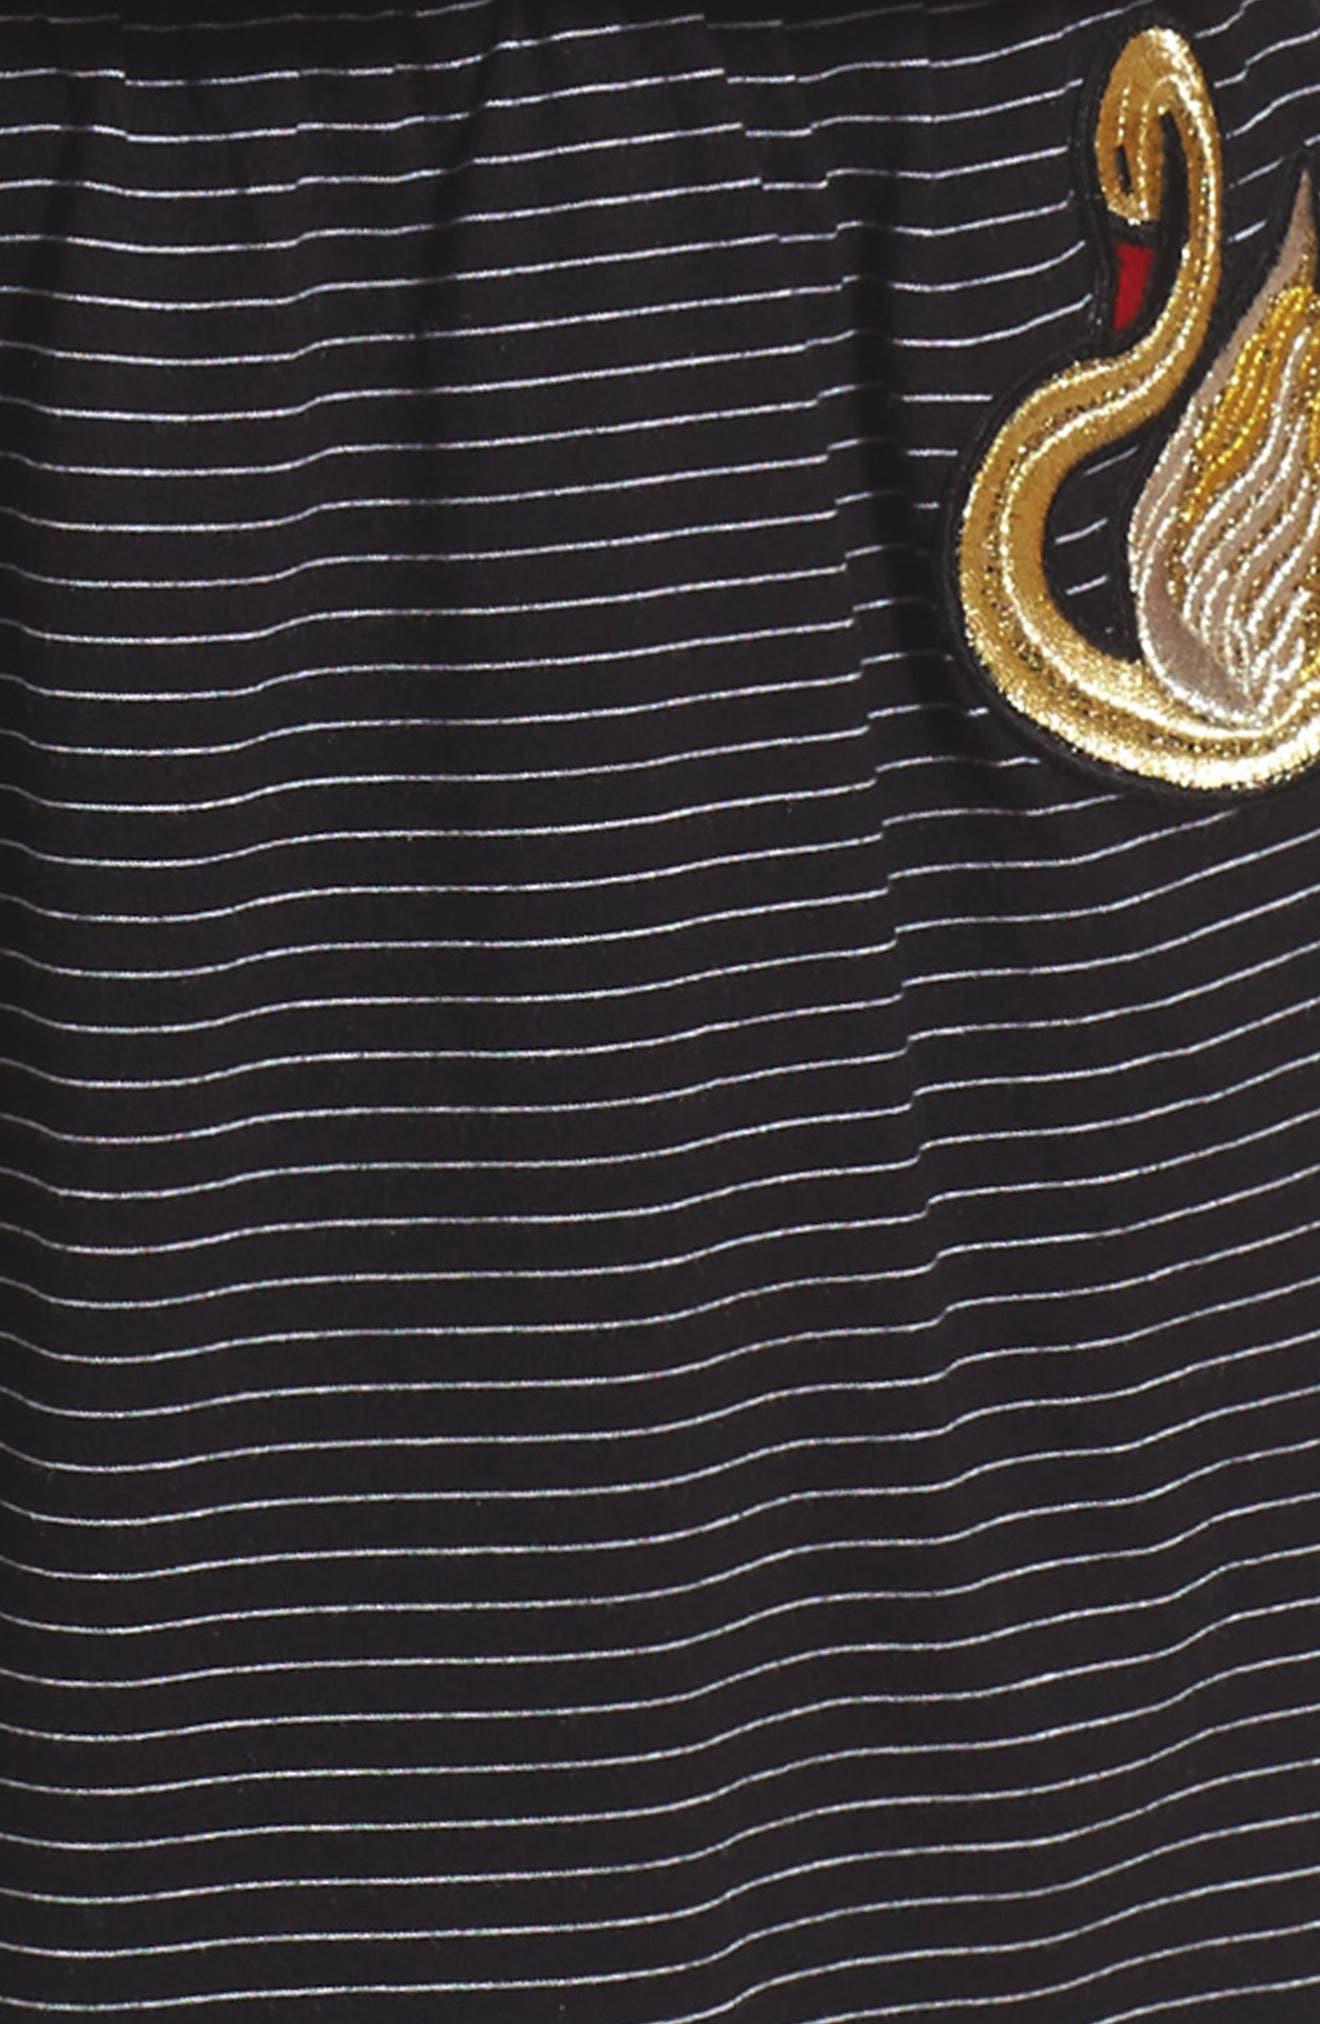 Swan Embroidered Blouson Dress,                             Alternate thumbnail 3, color,                             001